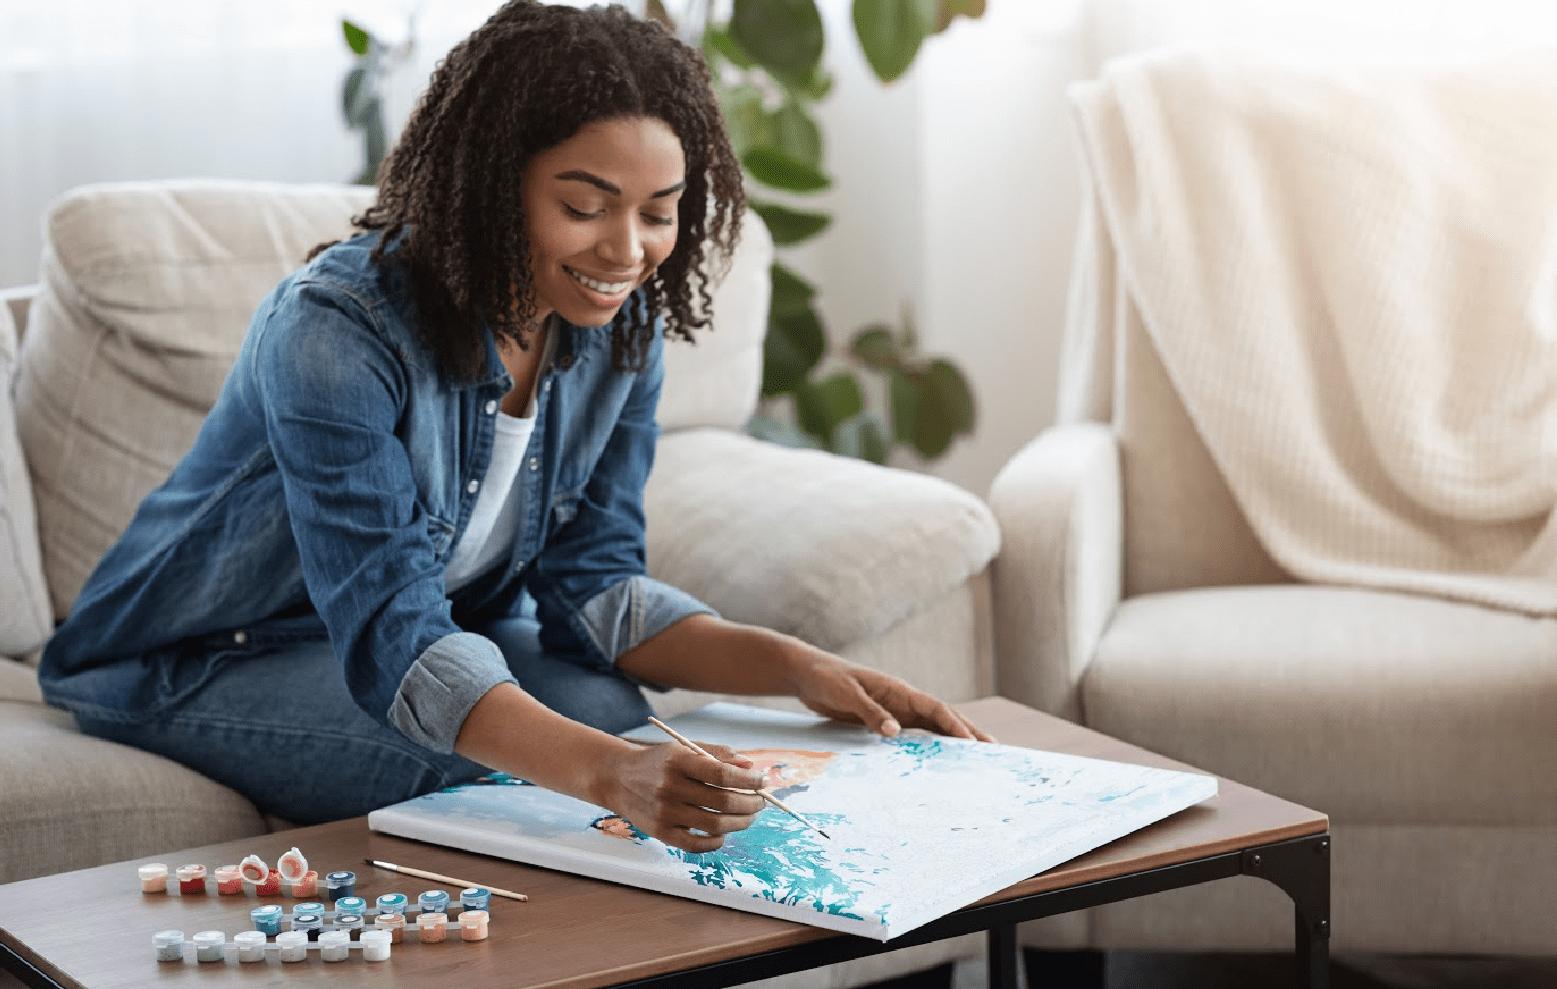 mental health and art